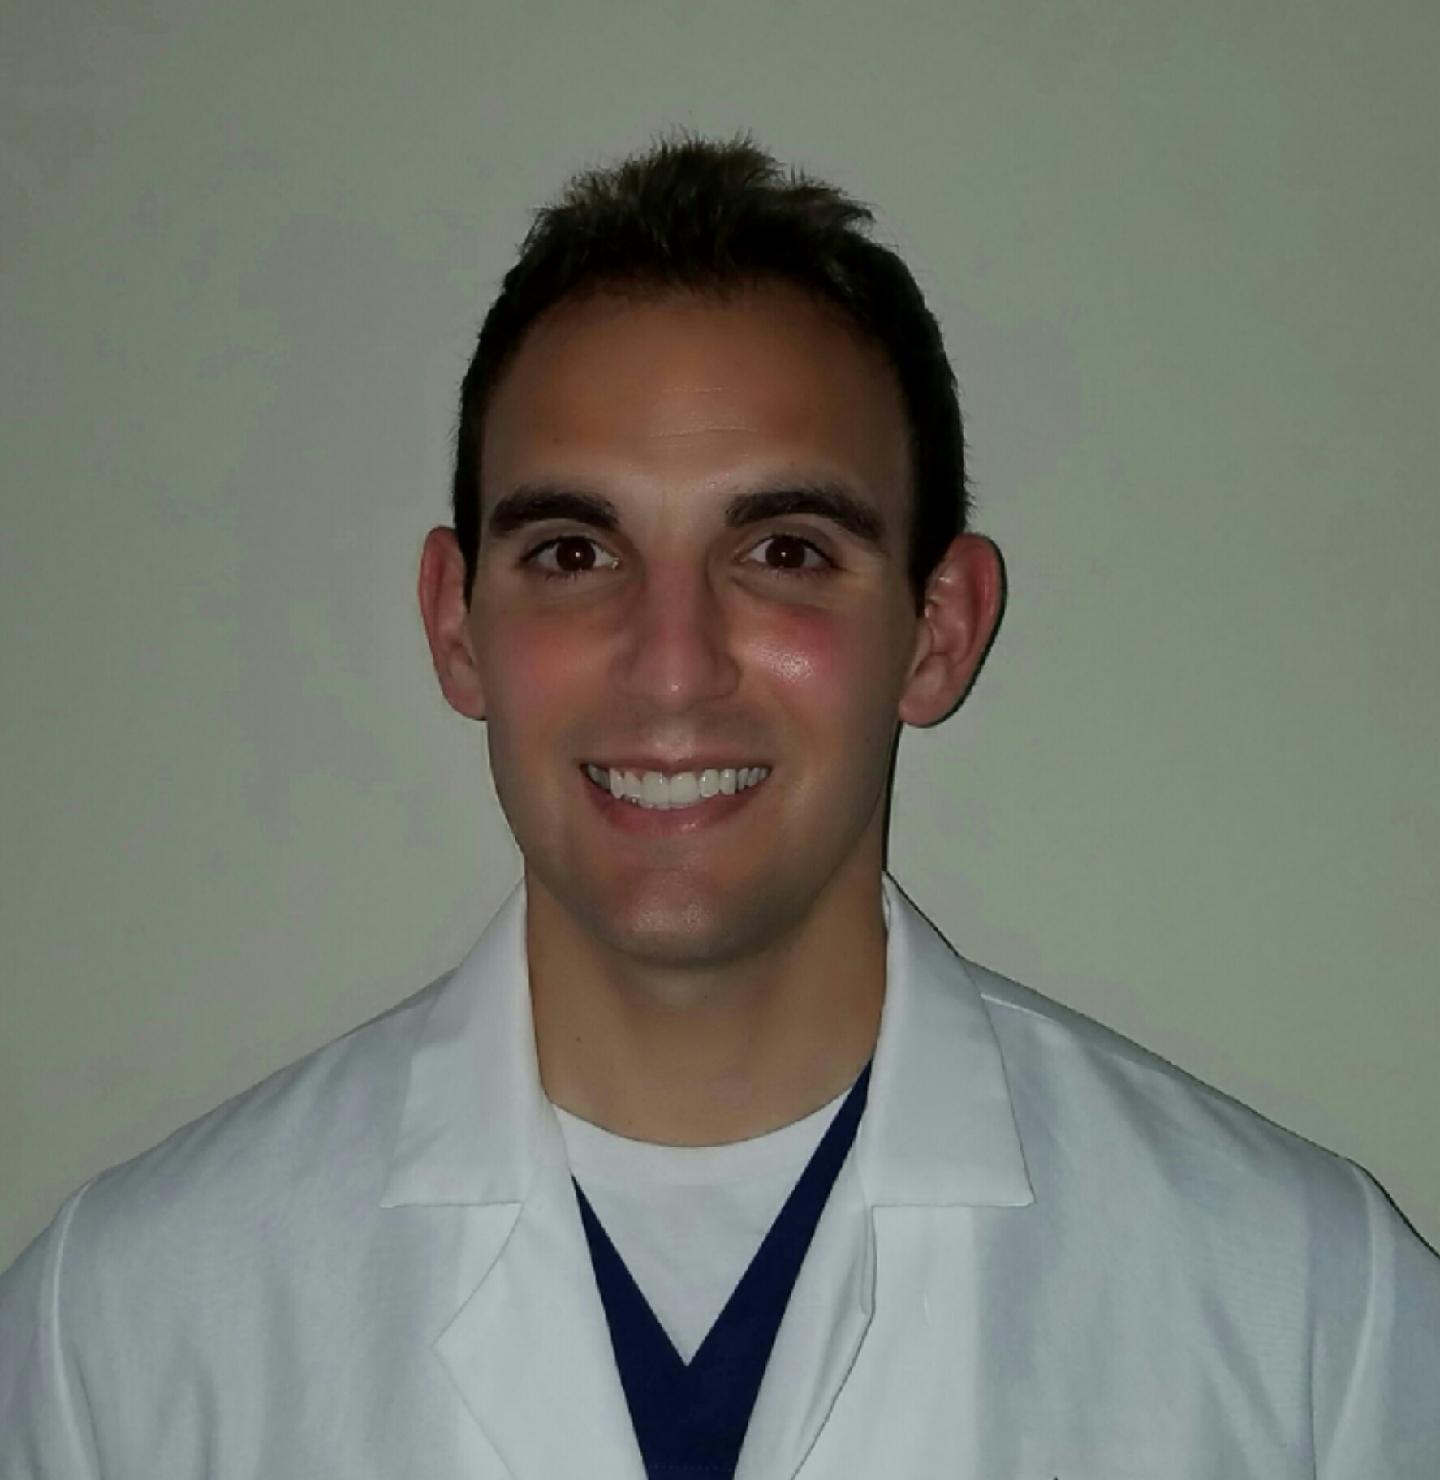 Dr. Ryan McCormick